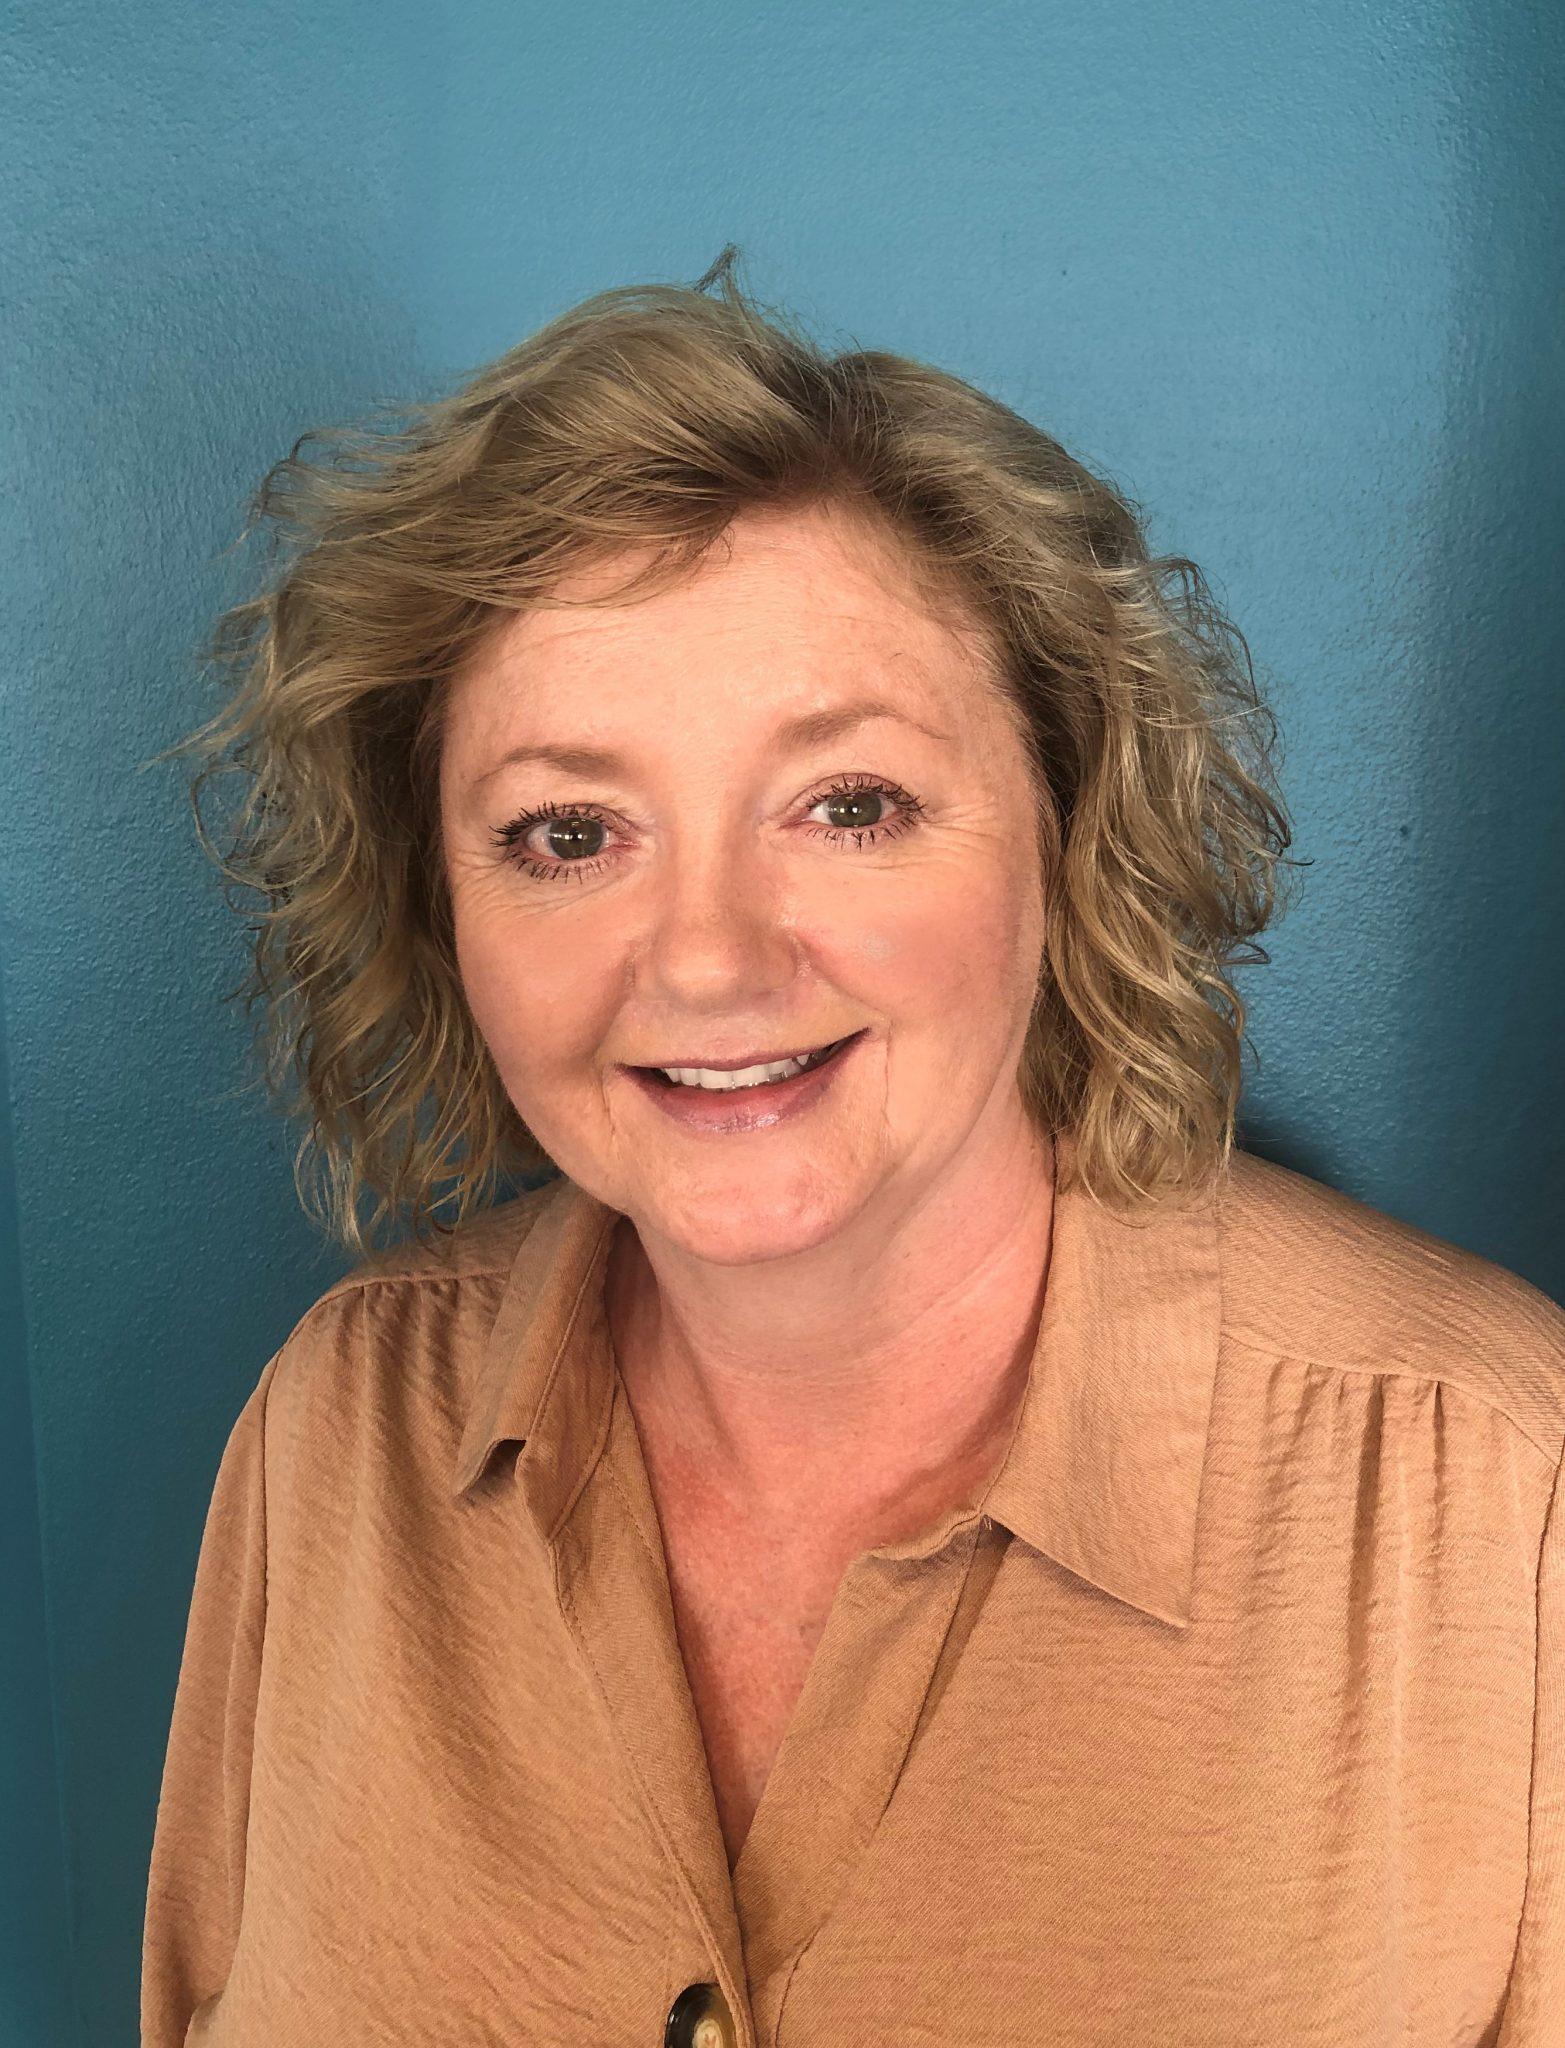 Angela Jamieson